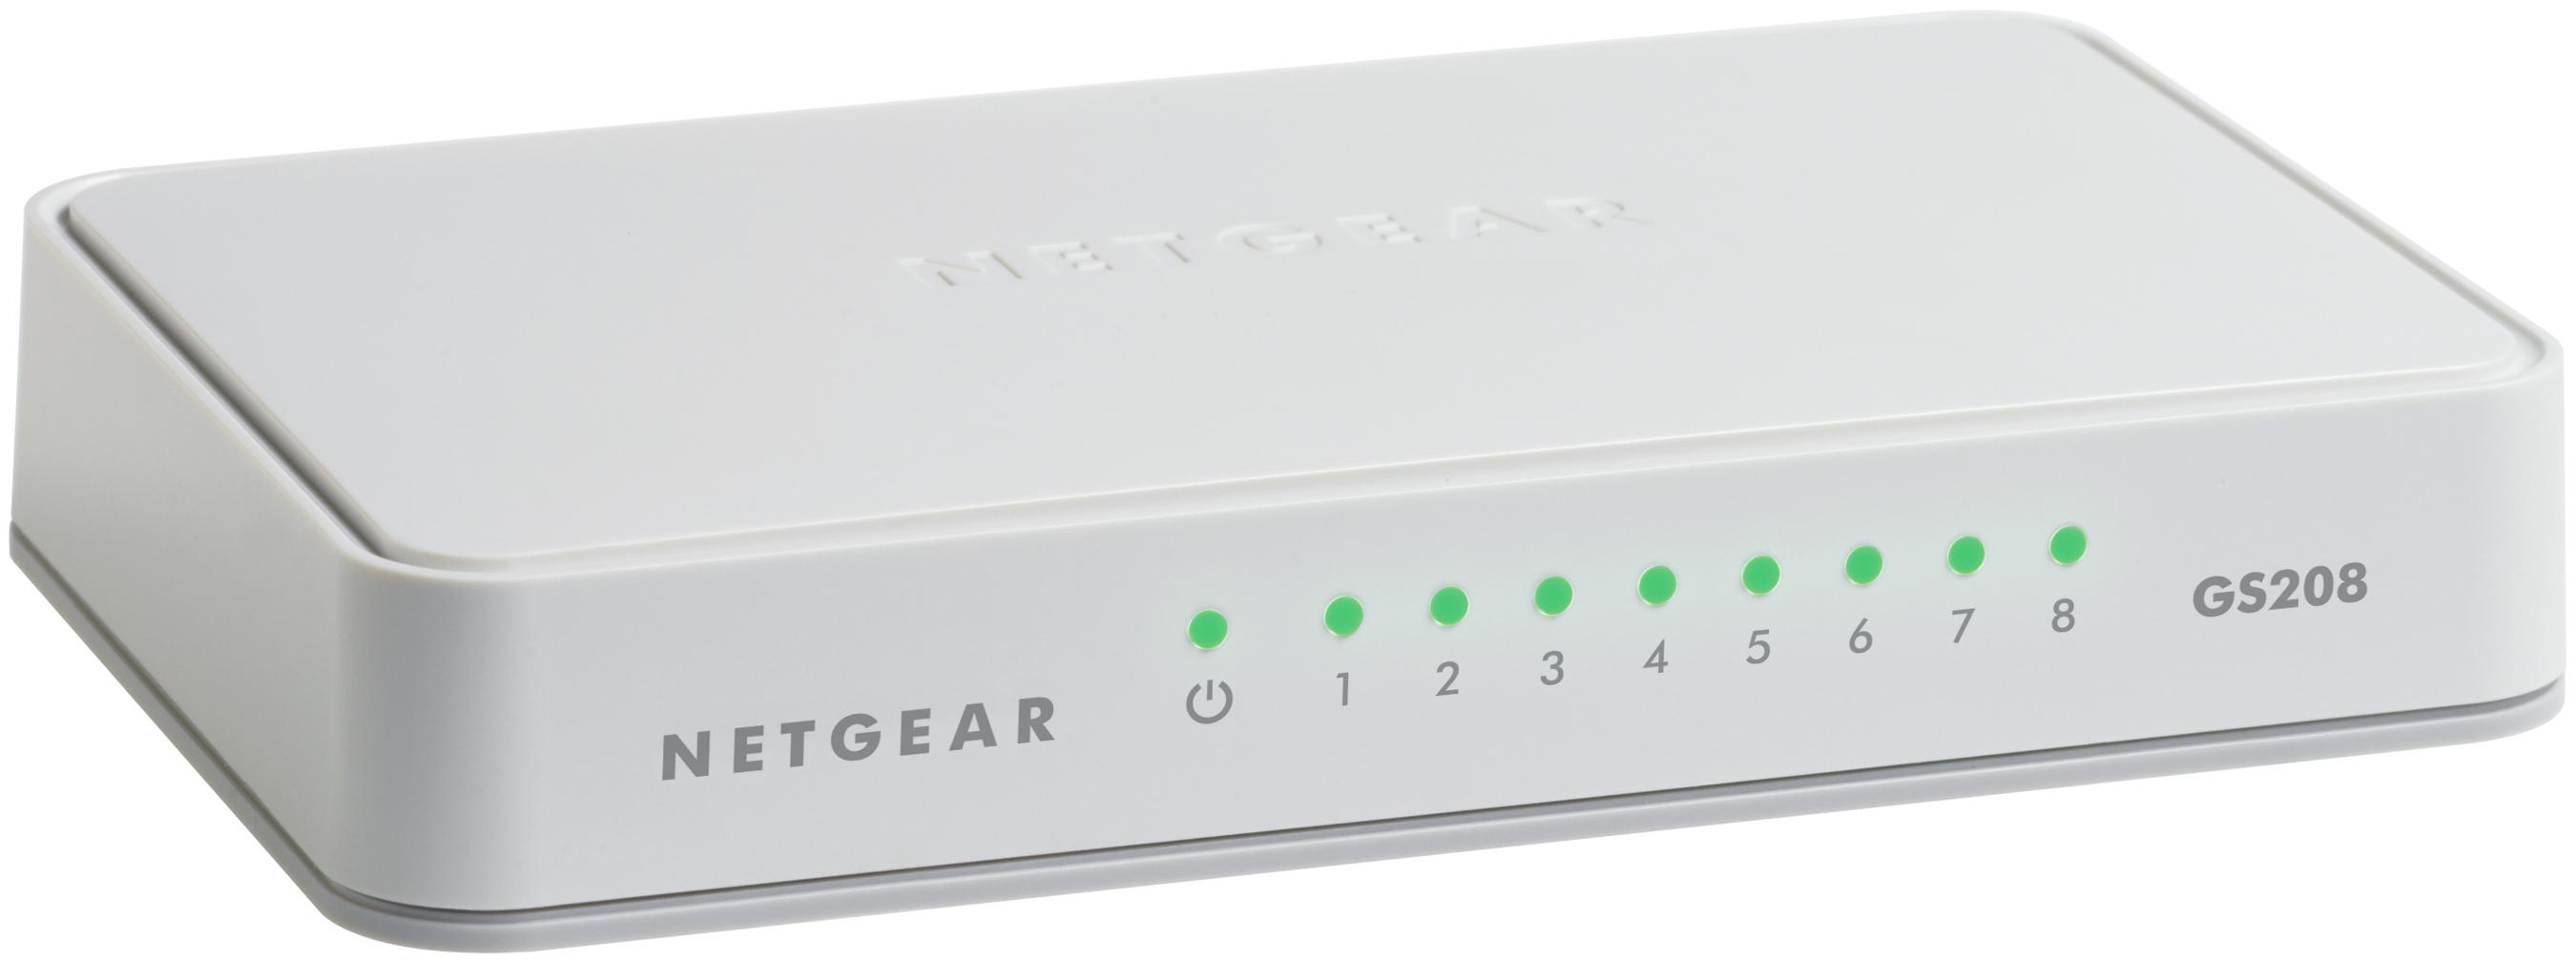 GS208-100PES Gigabit Ethernet Switch (8 poorten)